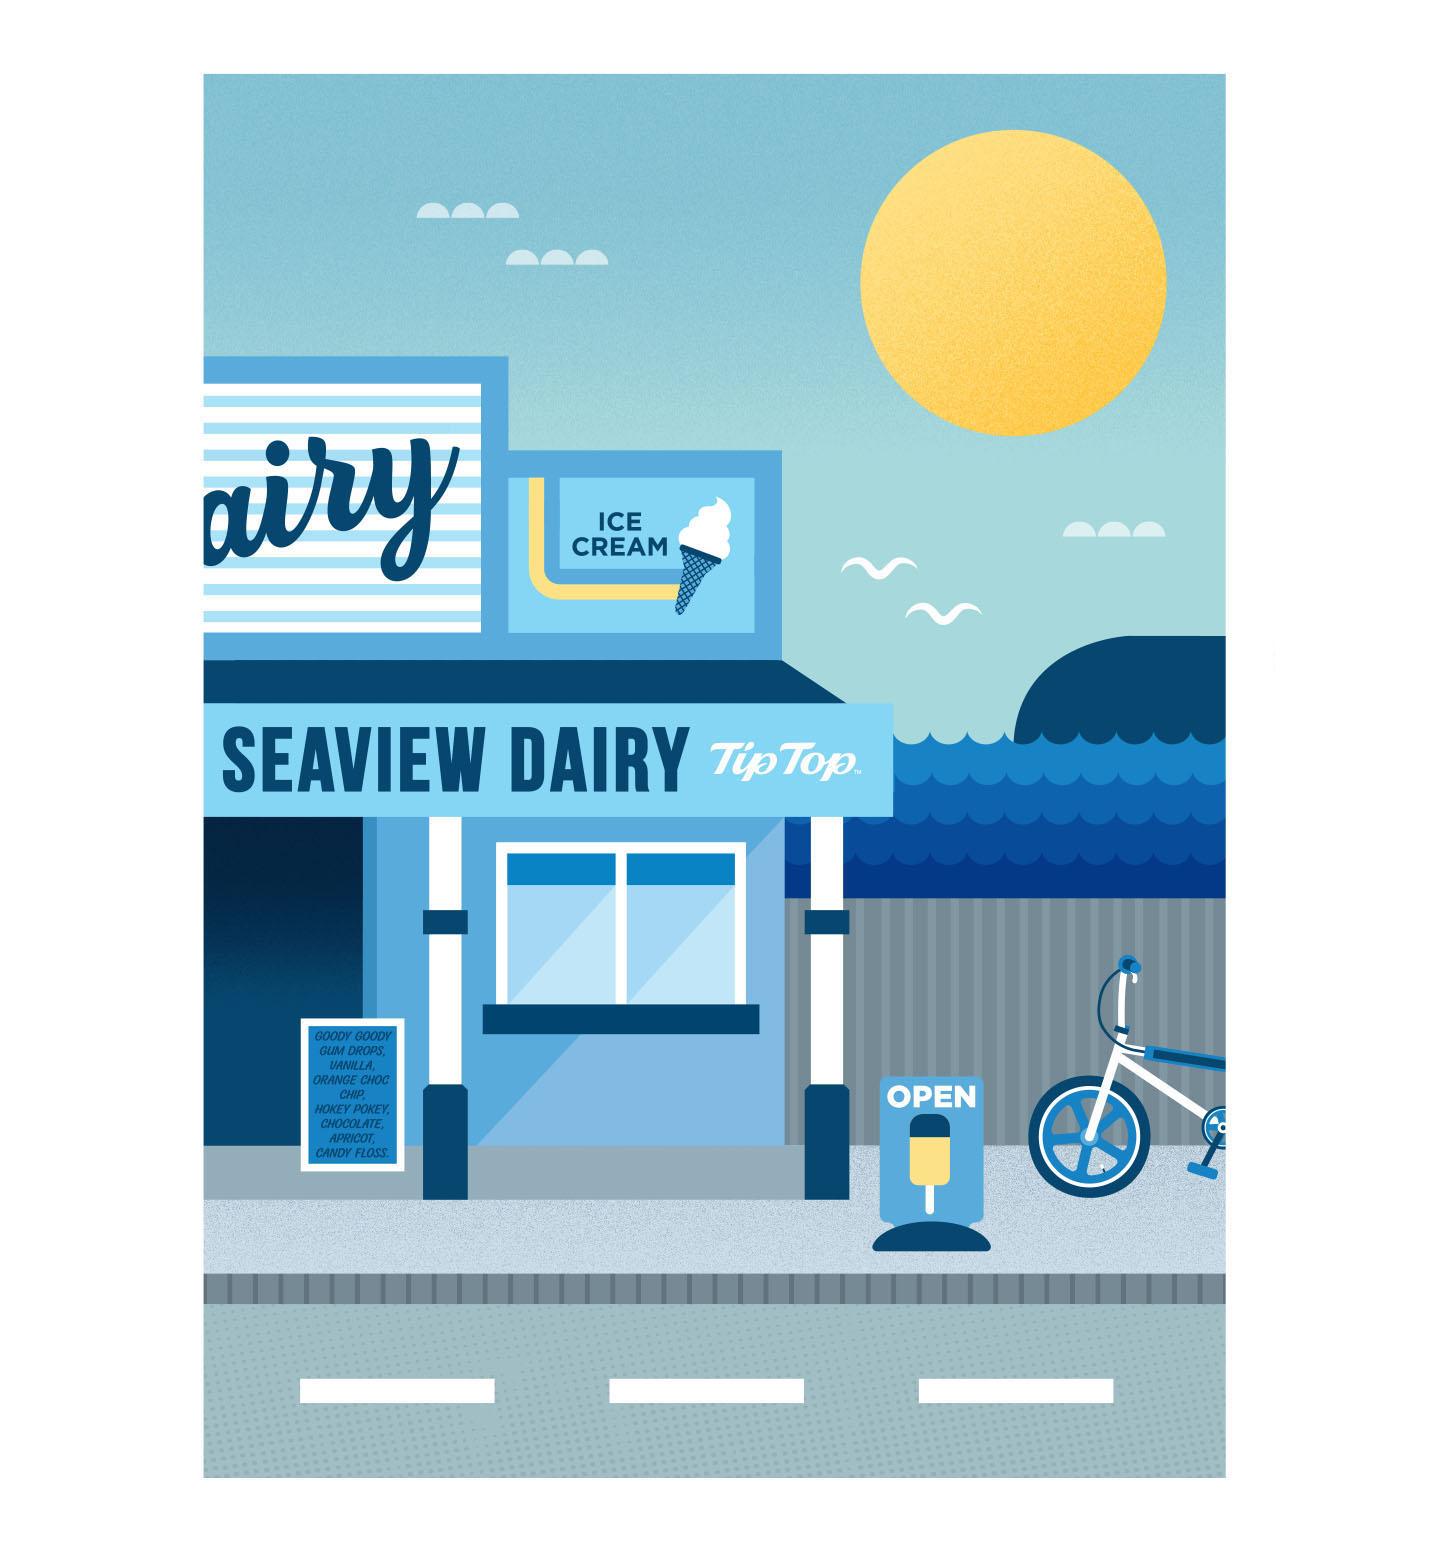 Greg Straight: Seaview Dairy